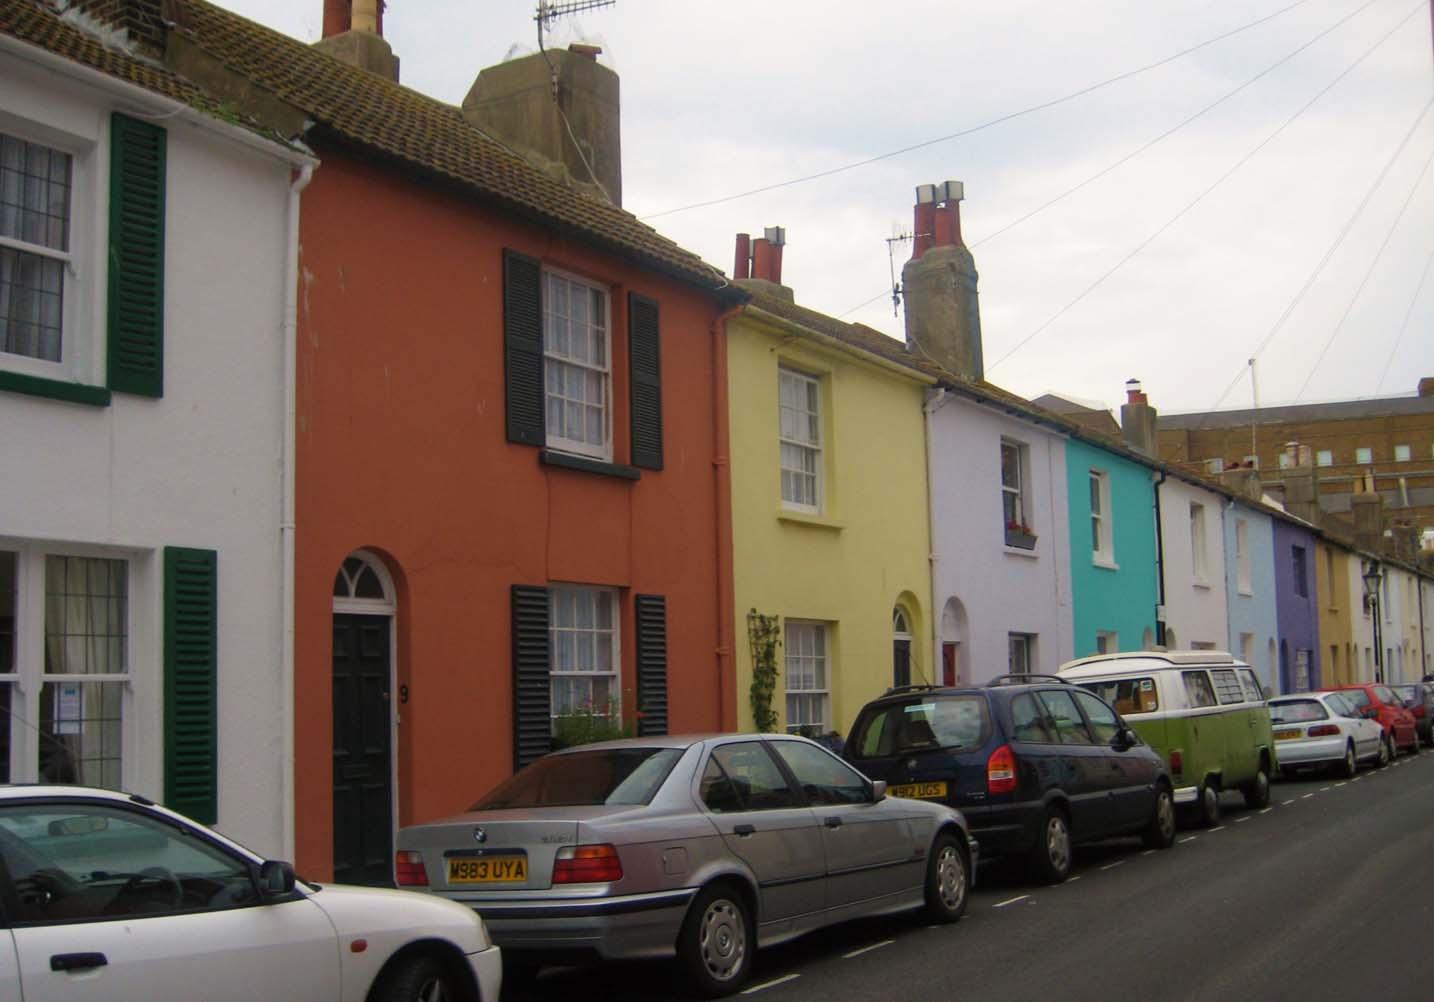 Brighton North Laine houses